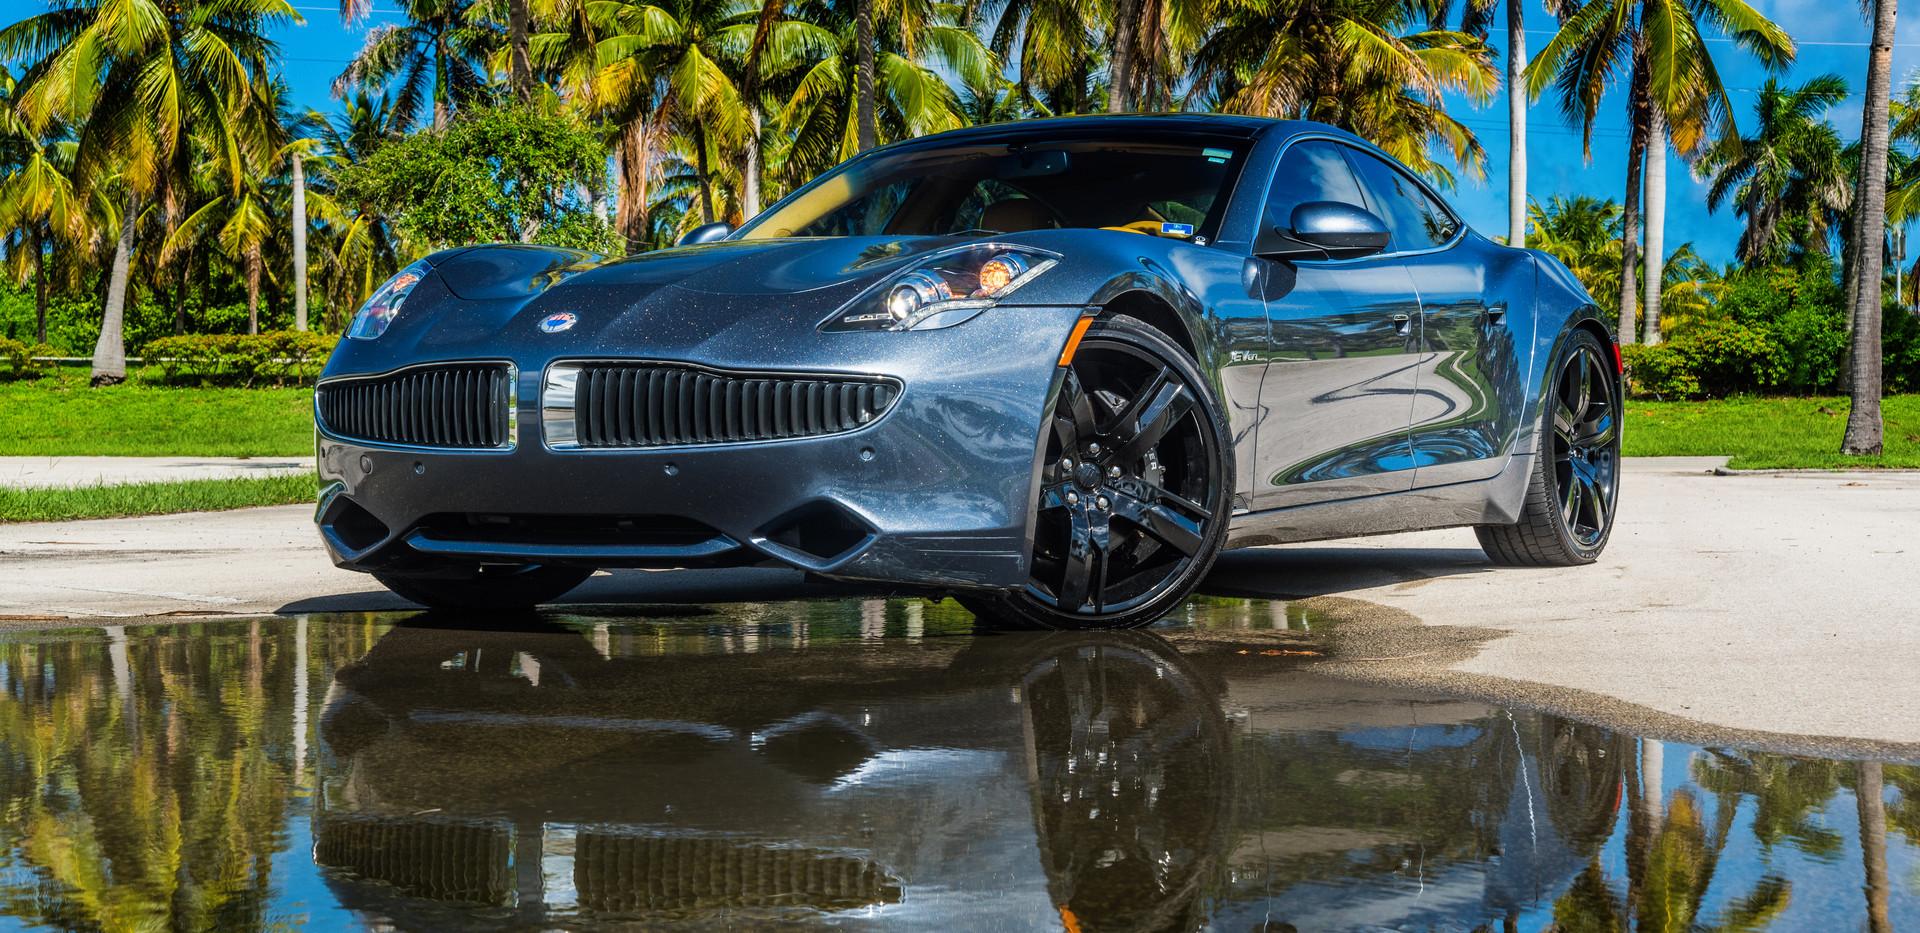 VIP Miami Auto Luxury Car Rentals